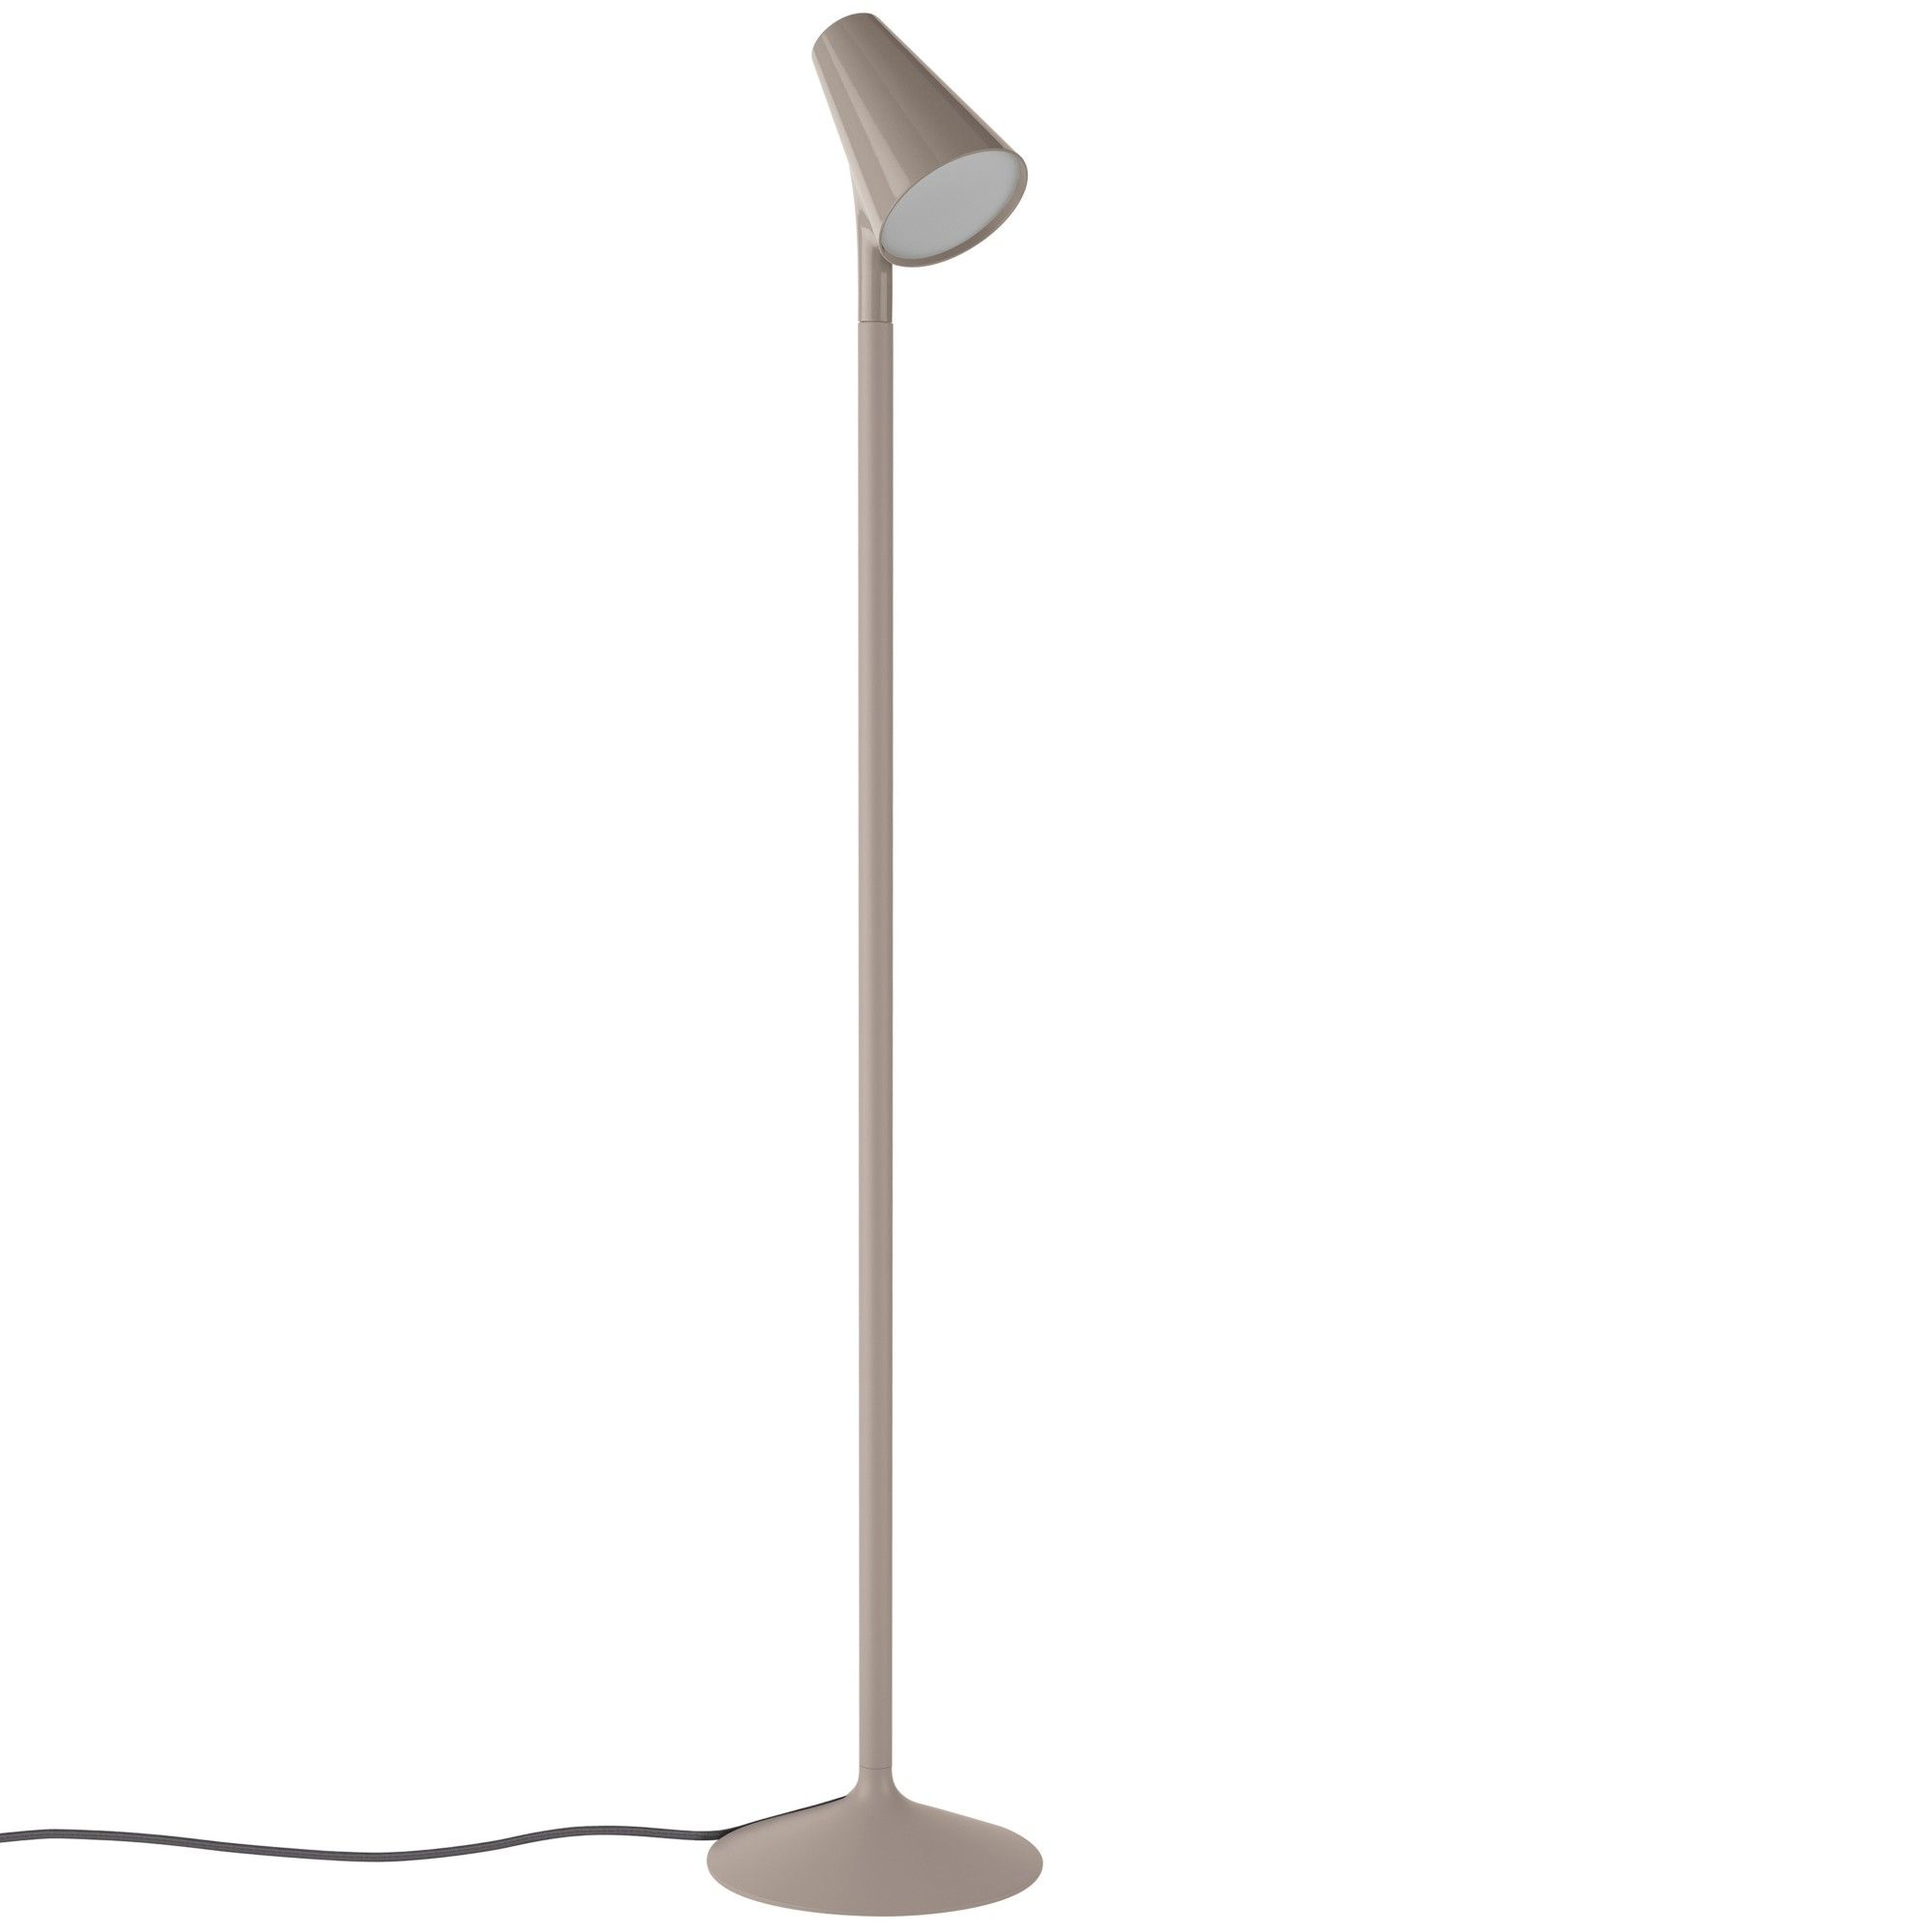 Philips lirio piculet led floor lamp cream lighting pinterest philips lirio piculet led floor lamp cream aloadofball Image collections